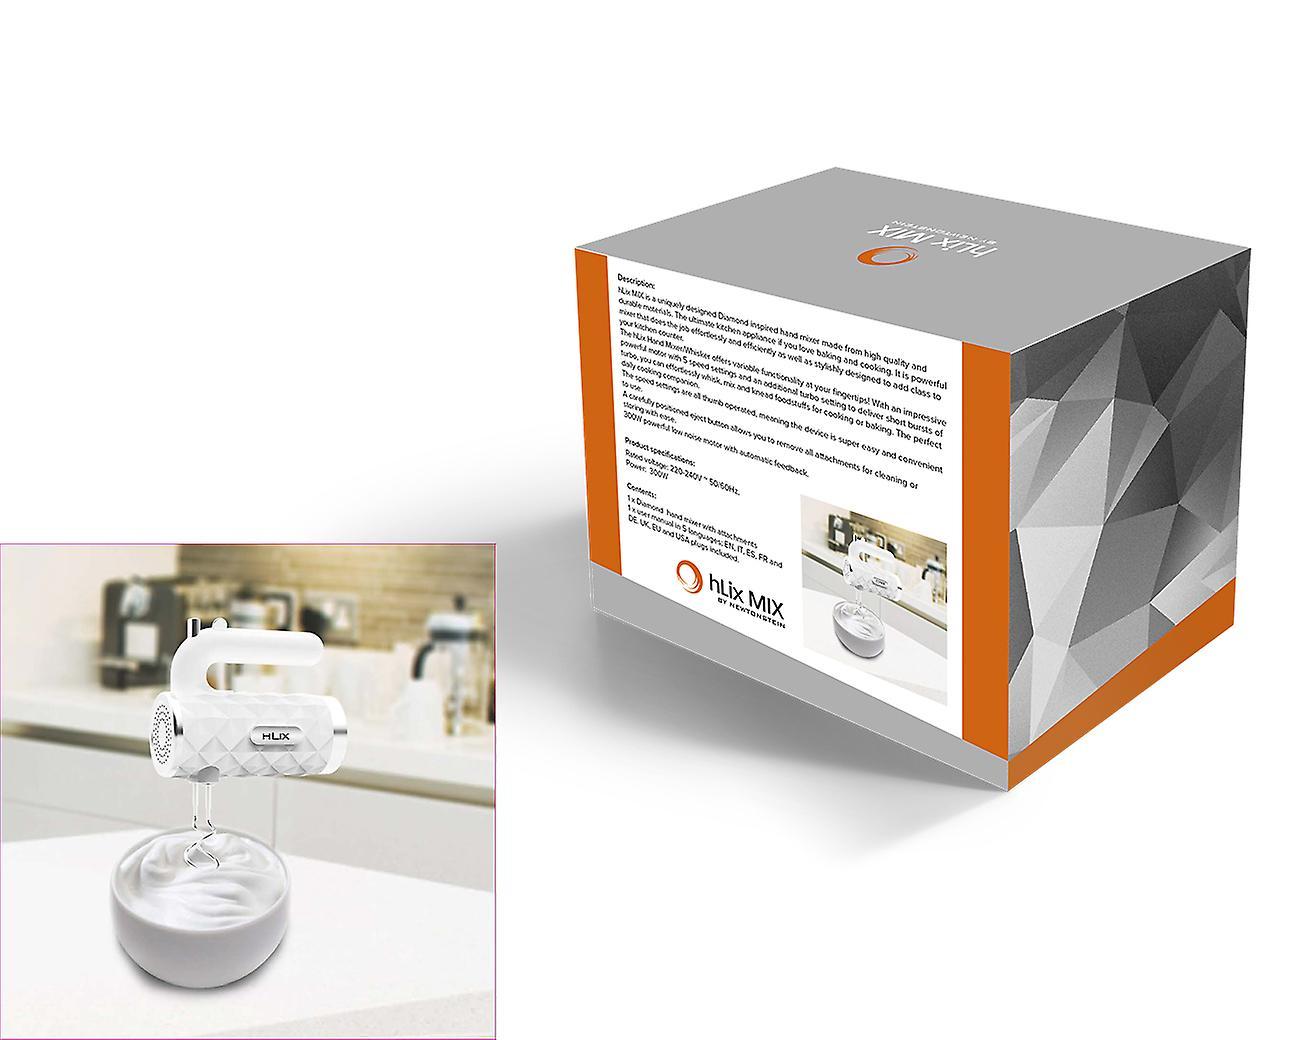 Automatische Mixer Keuken : Hlix mix diamond wit w hand mixer whisker met chrome kloppers